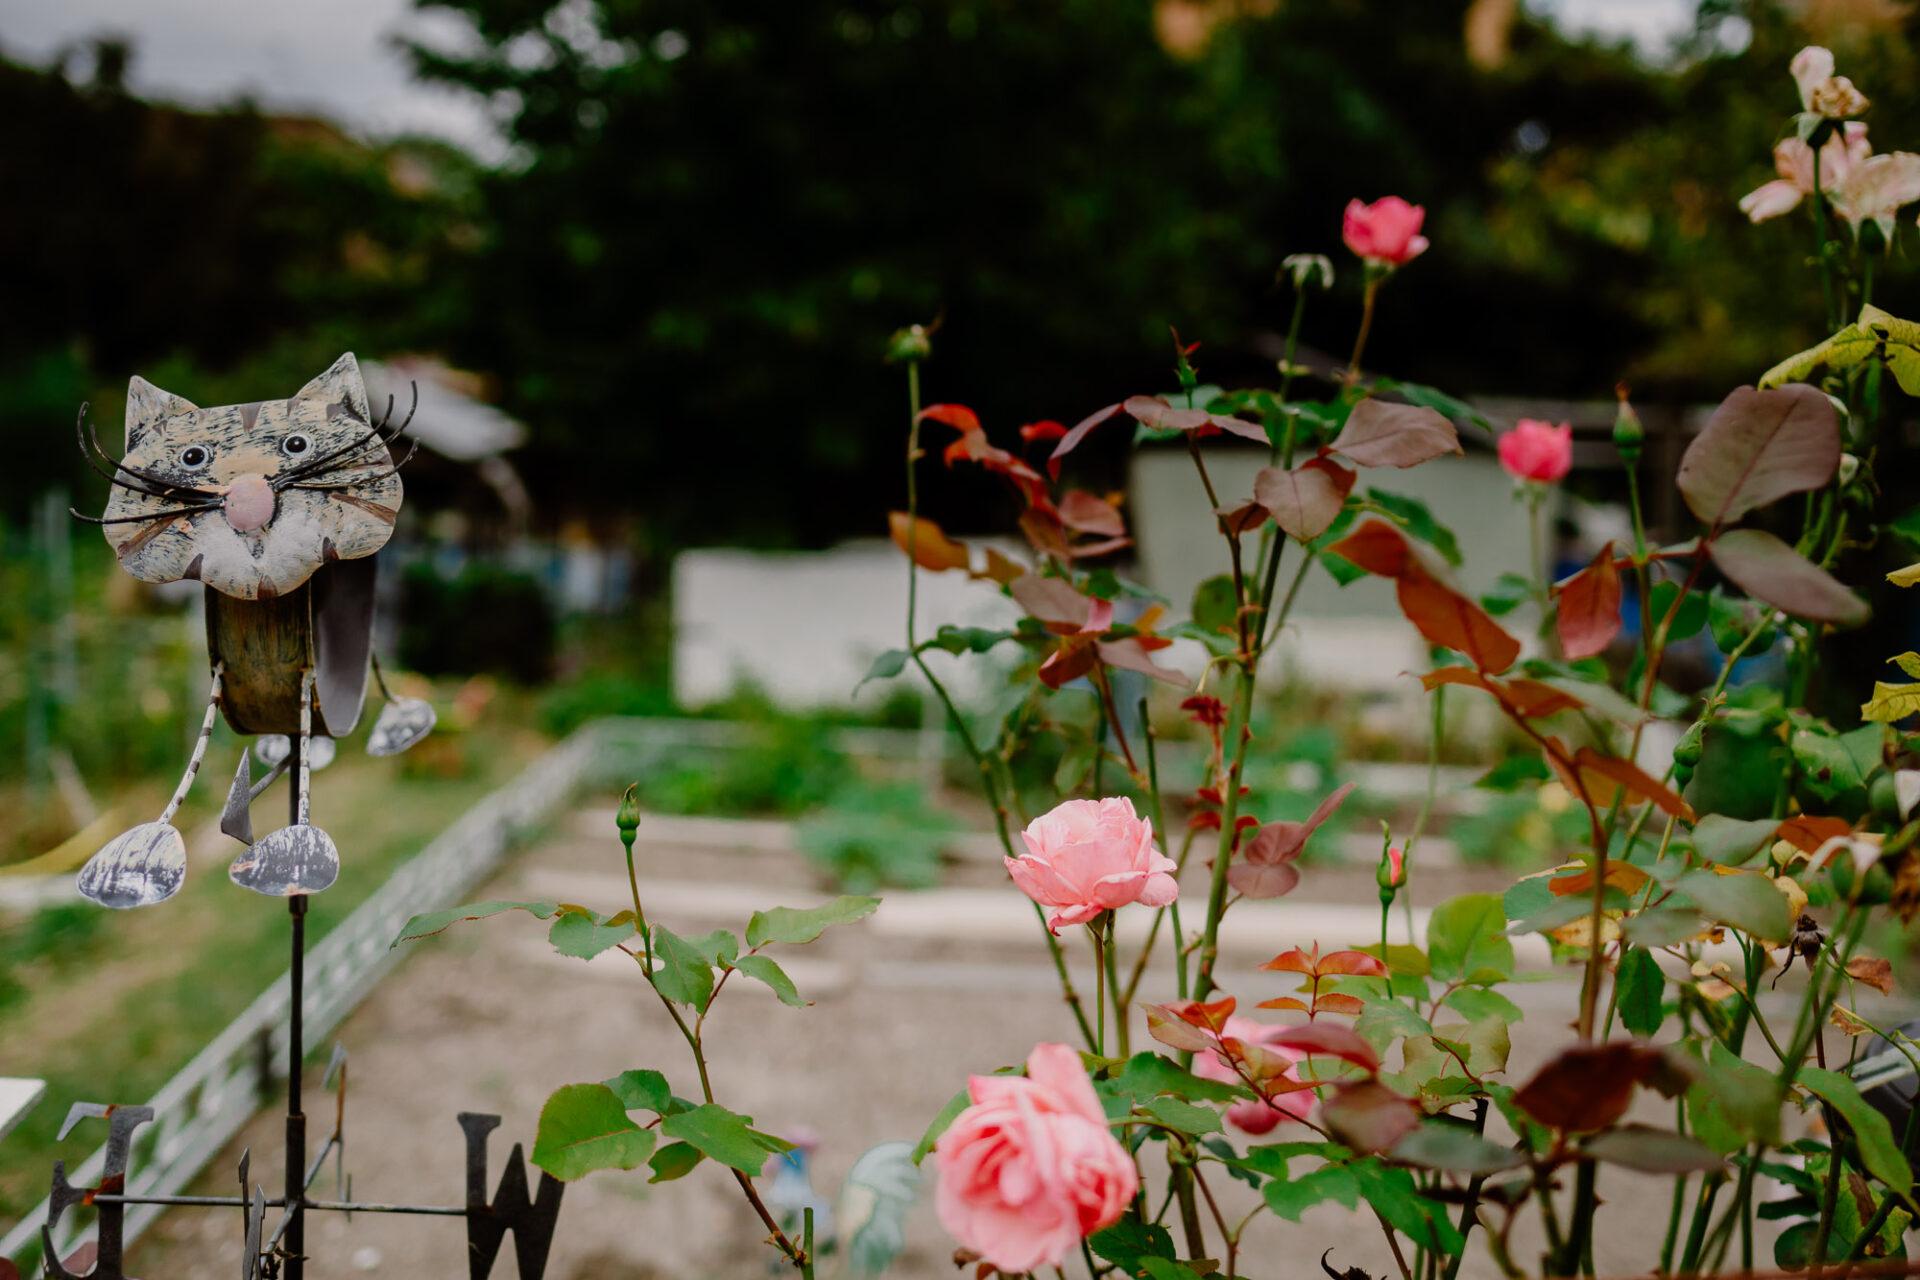 Jardins ouvriers aubervilliers 36 - Dagmara Bojenko - Eco-conscious Weddings, Births & Families